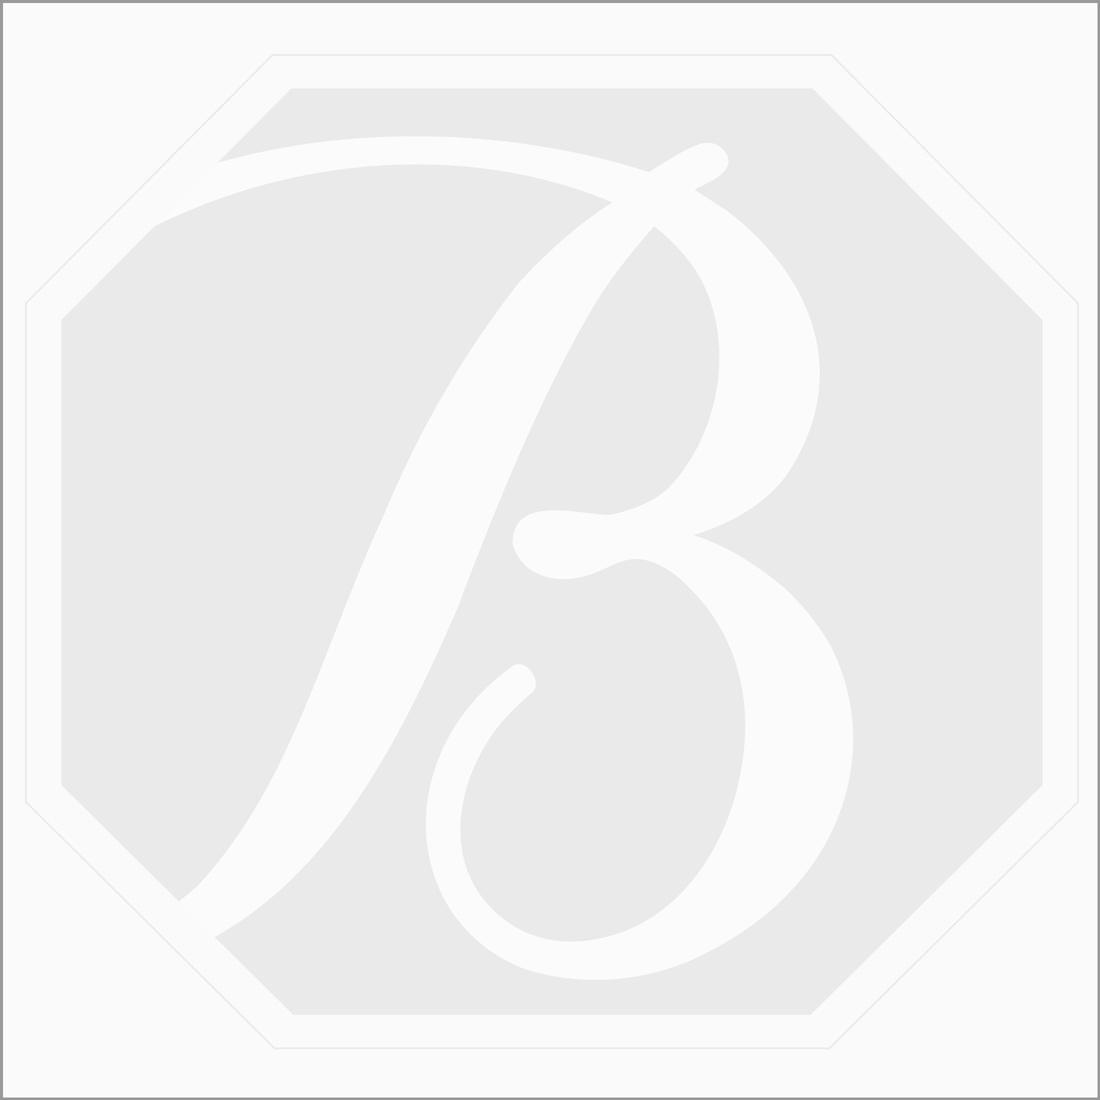 3 Pieces - Medium Tones Multi-Sapphire Rose Cut - 18 x 14.50 mm to 19 x 14.50 mm - 57 carats (MSRC1218)